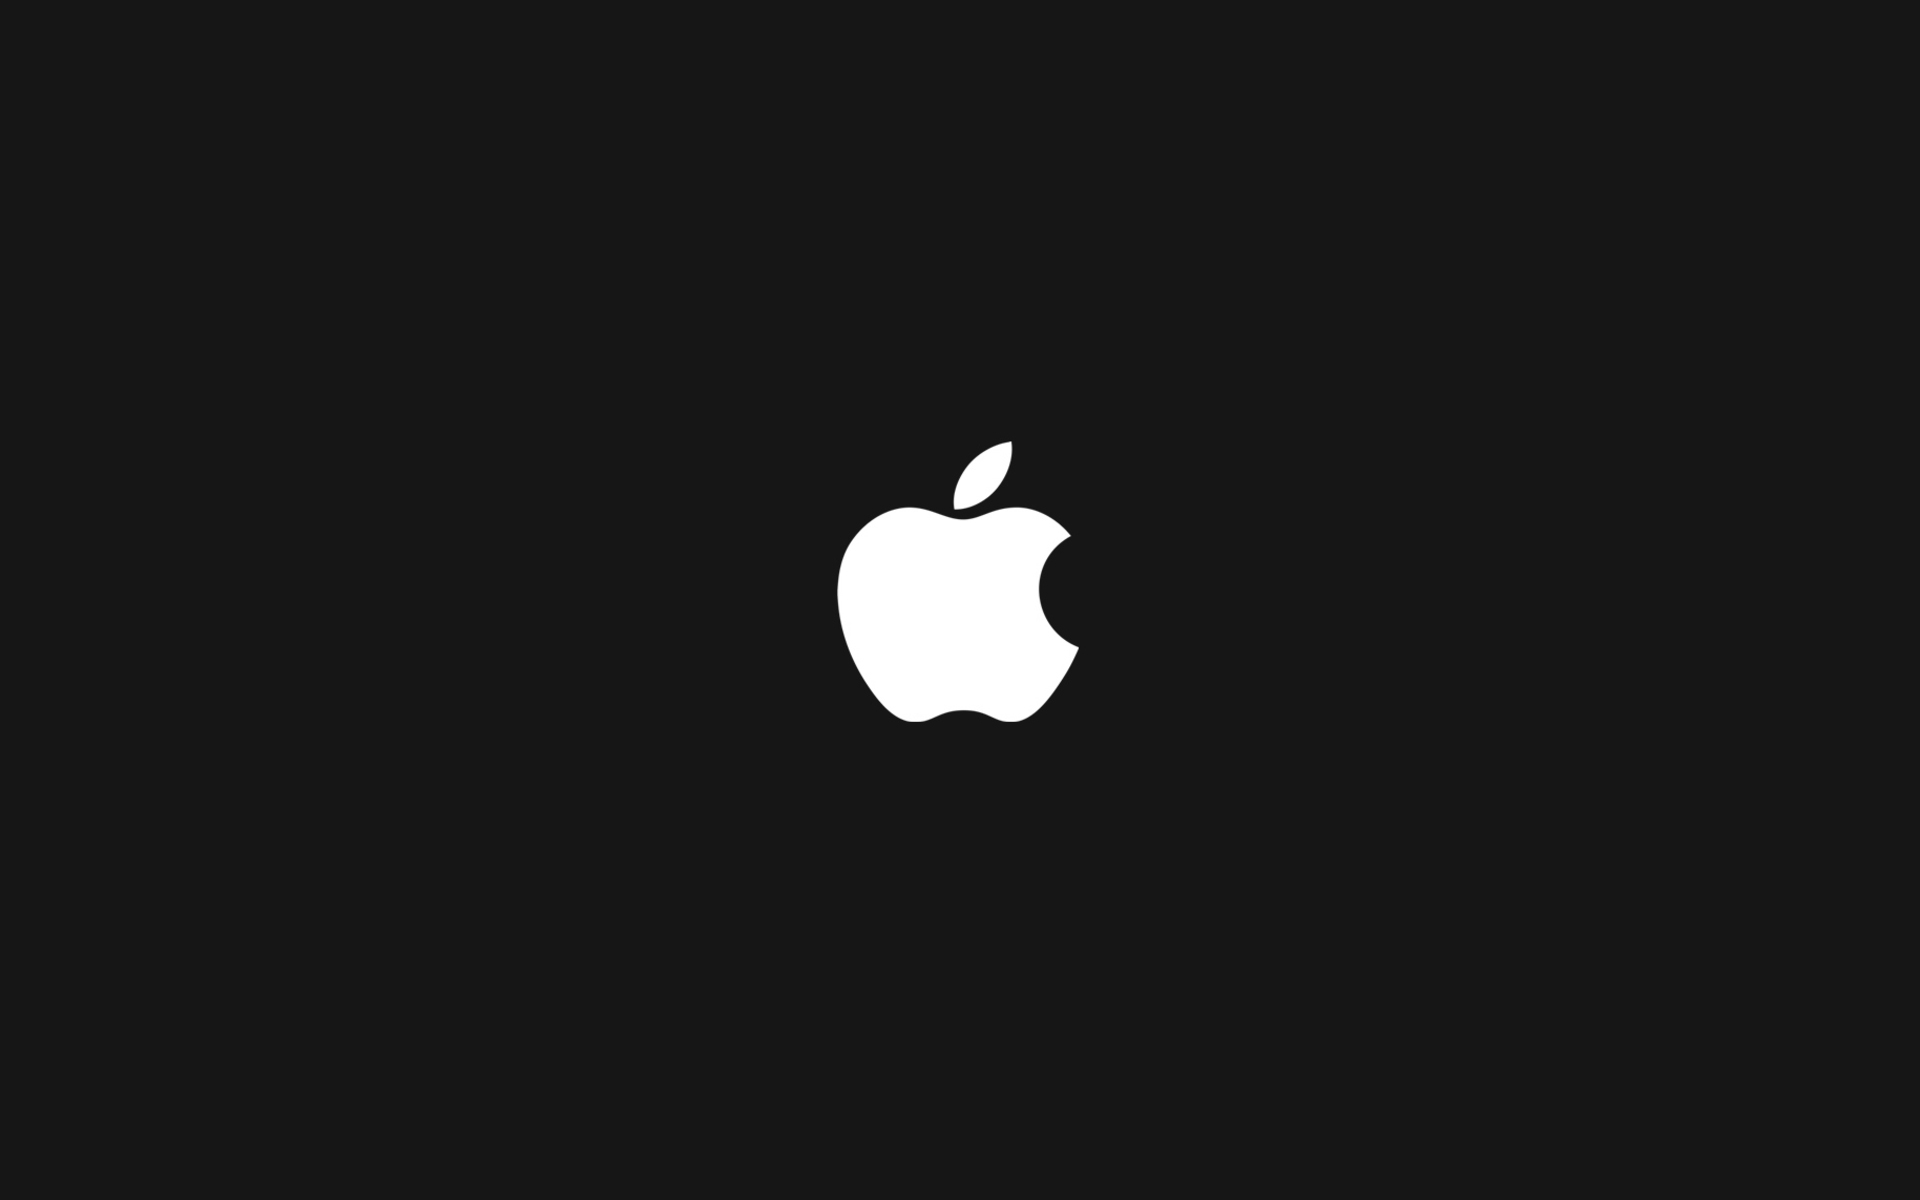 Amazing Wallpaper Music Macbook - Apple-Logo  Graphic_625220.jpg